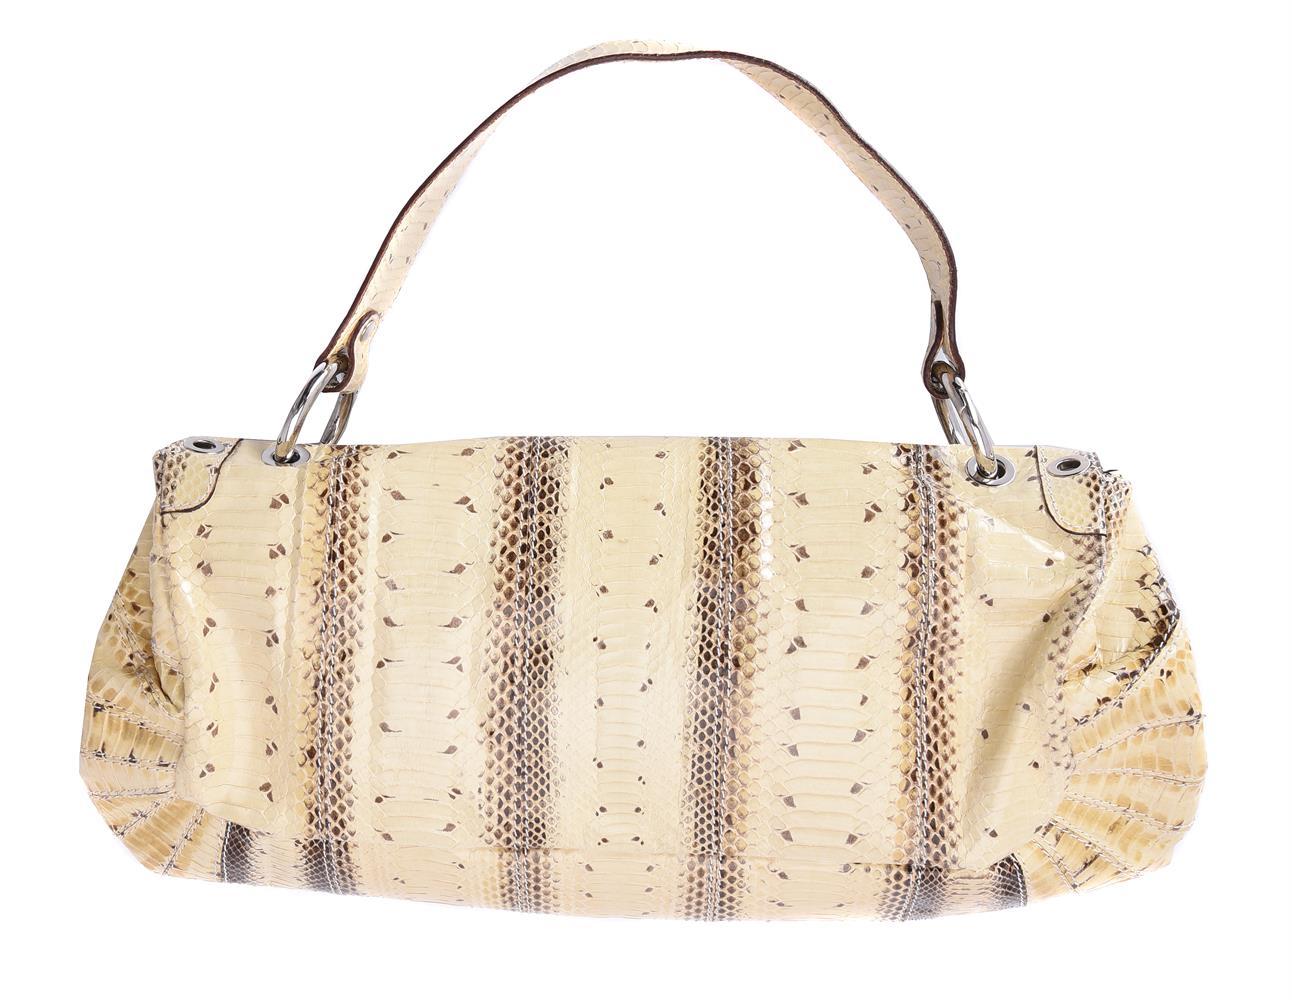 Y Dolce & Gabbana, a python skin handbag - Image 2 of 3